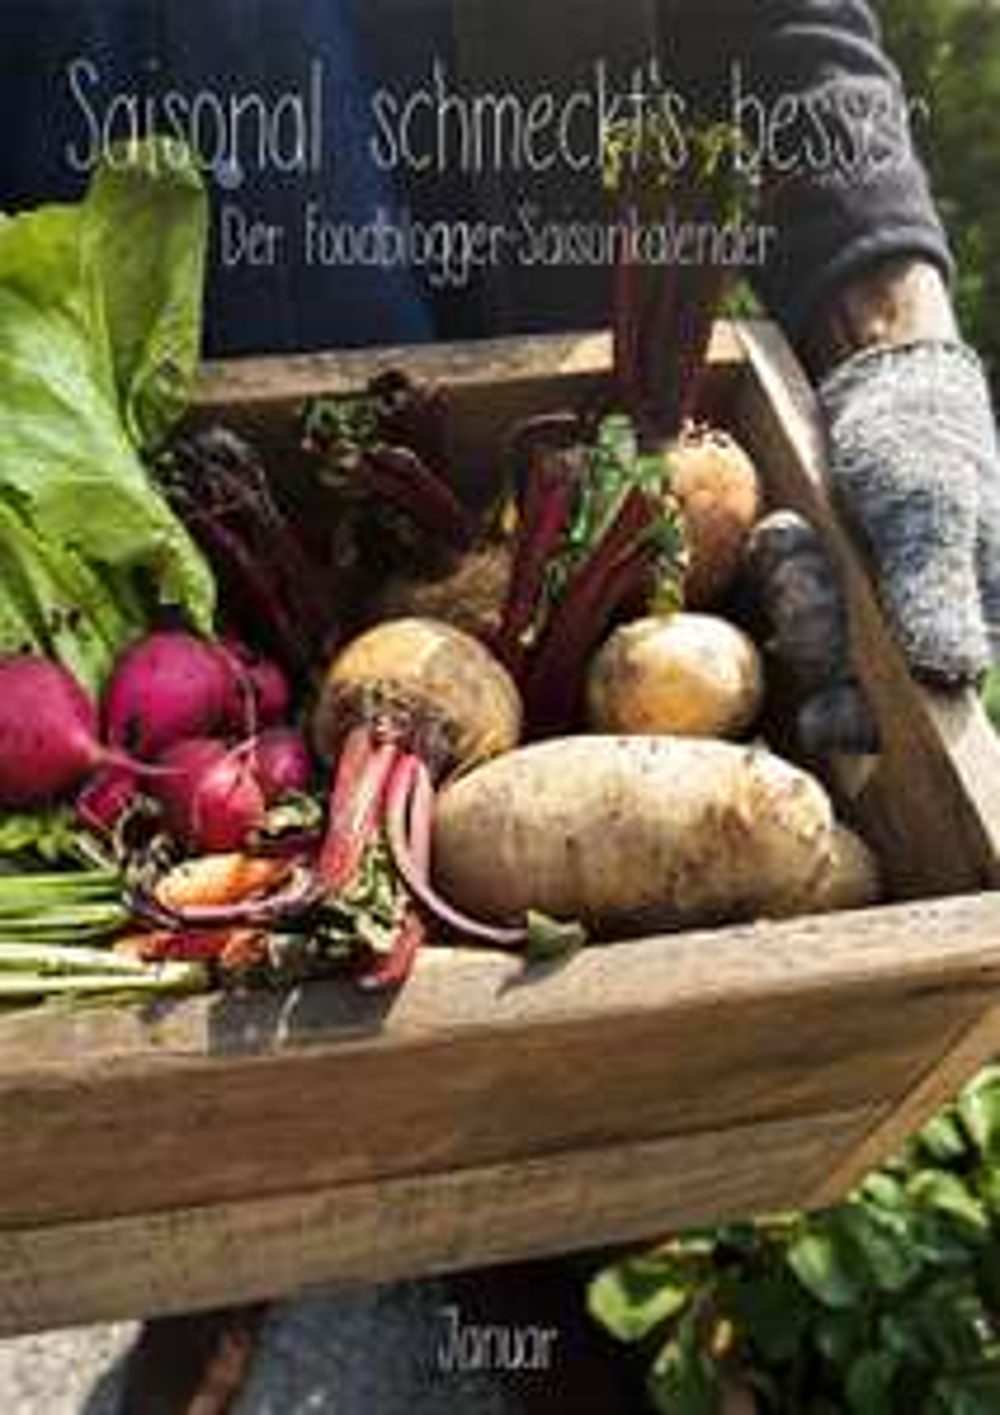 kostenloses Ebook: Saisonal schmeckt's besser!